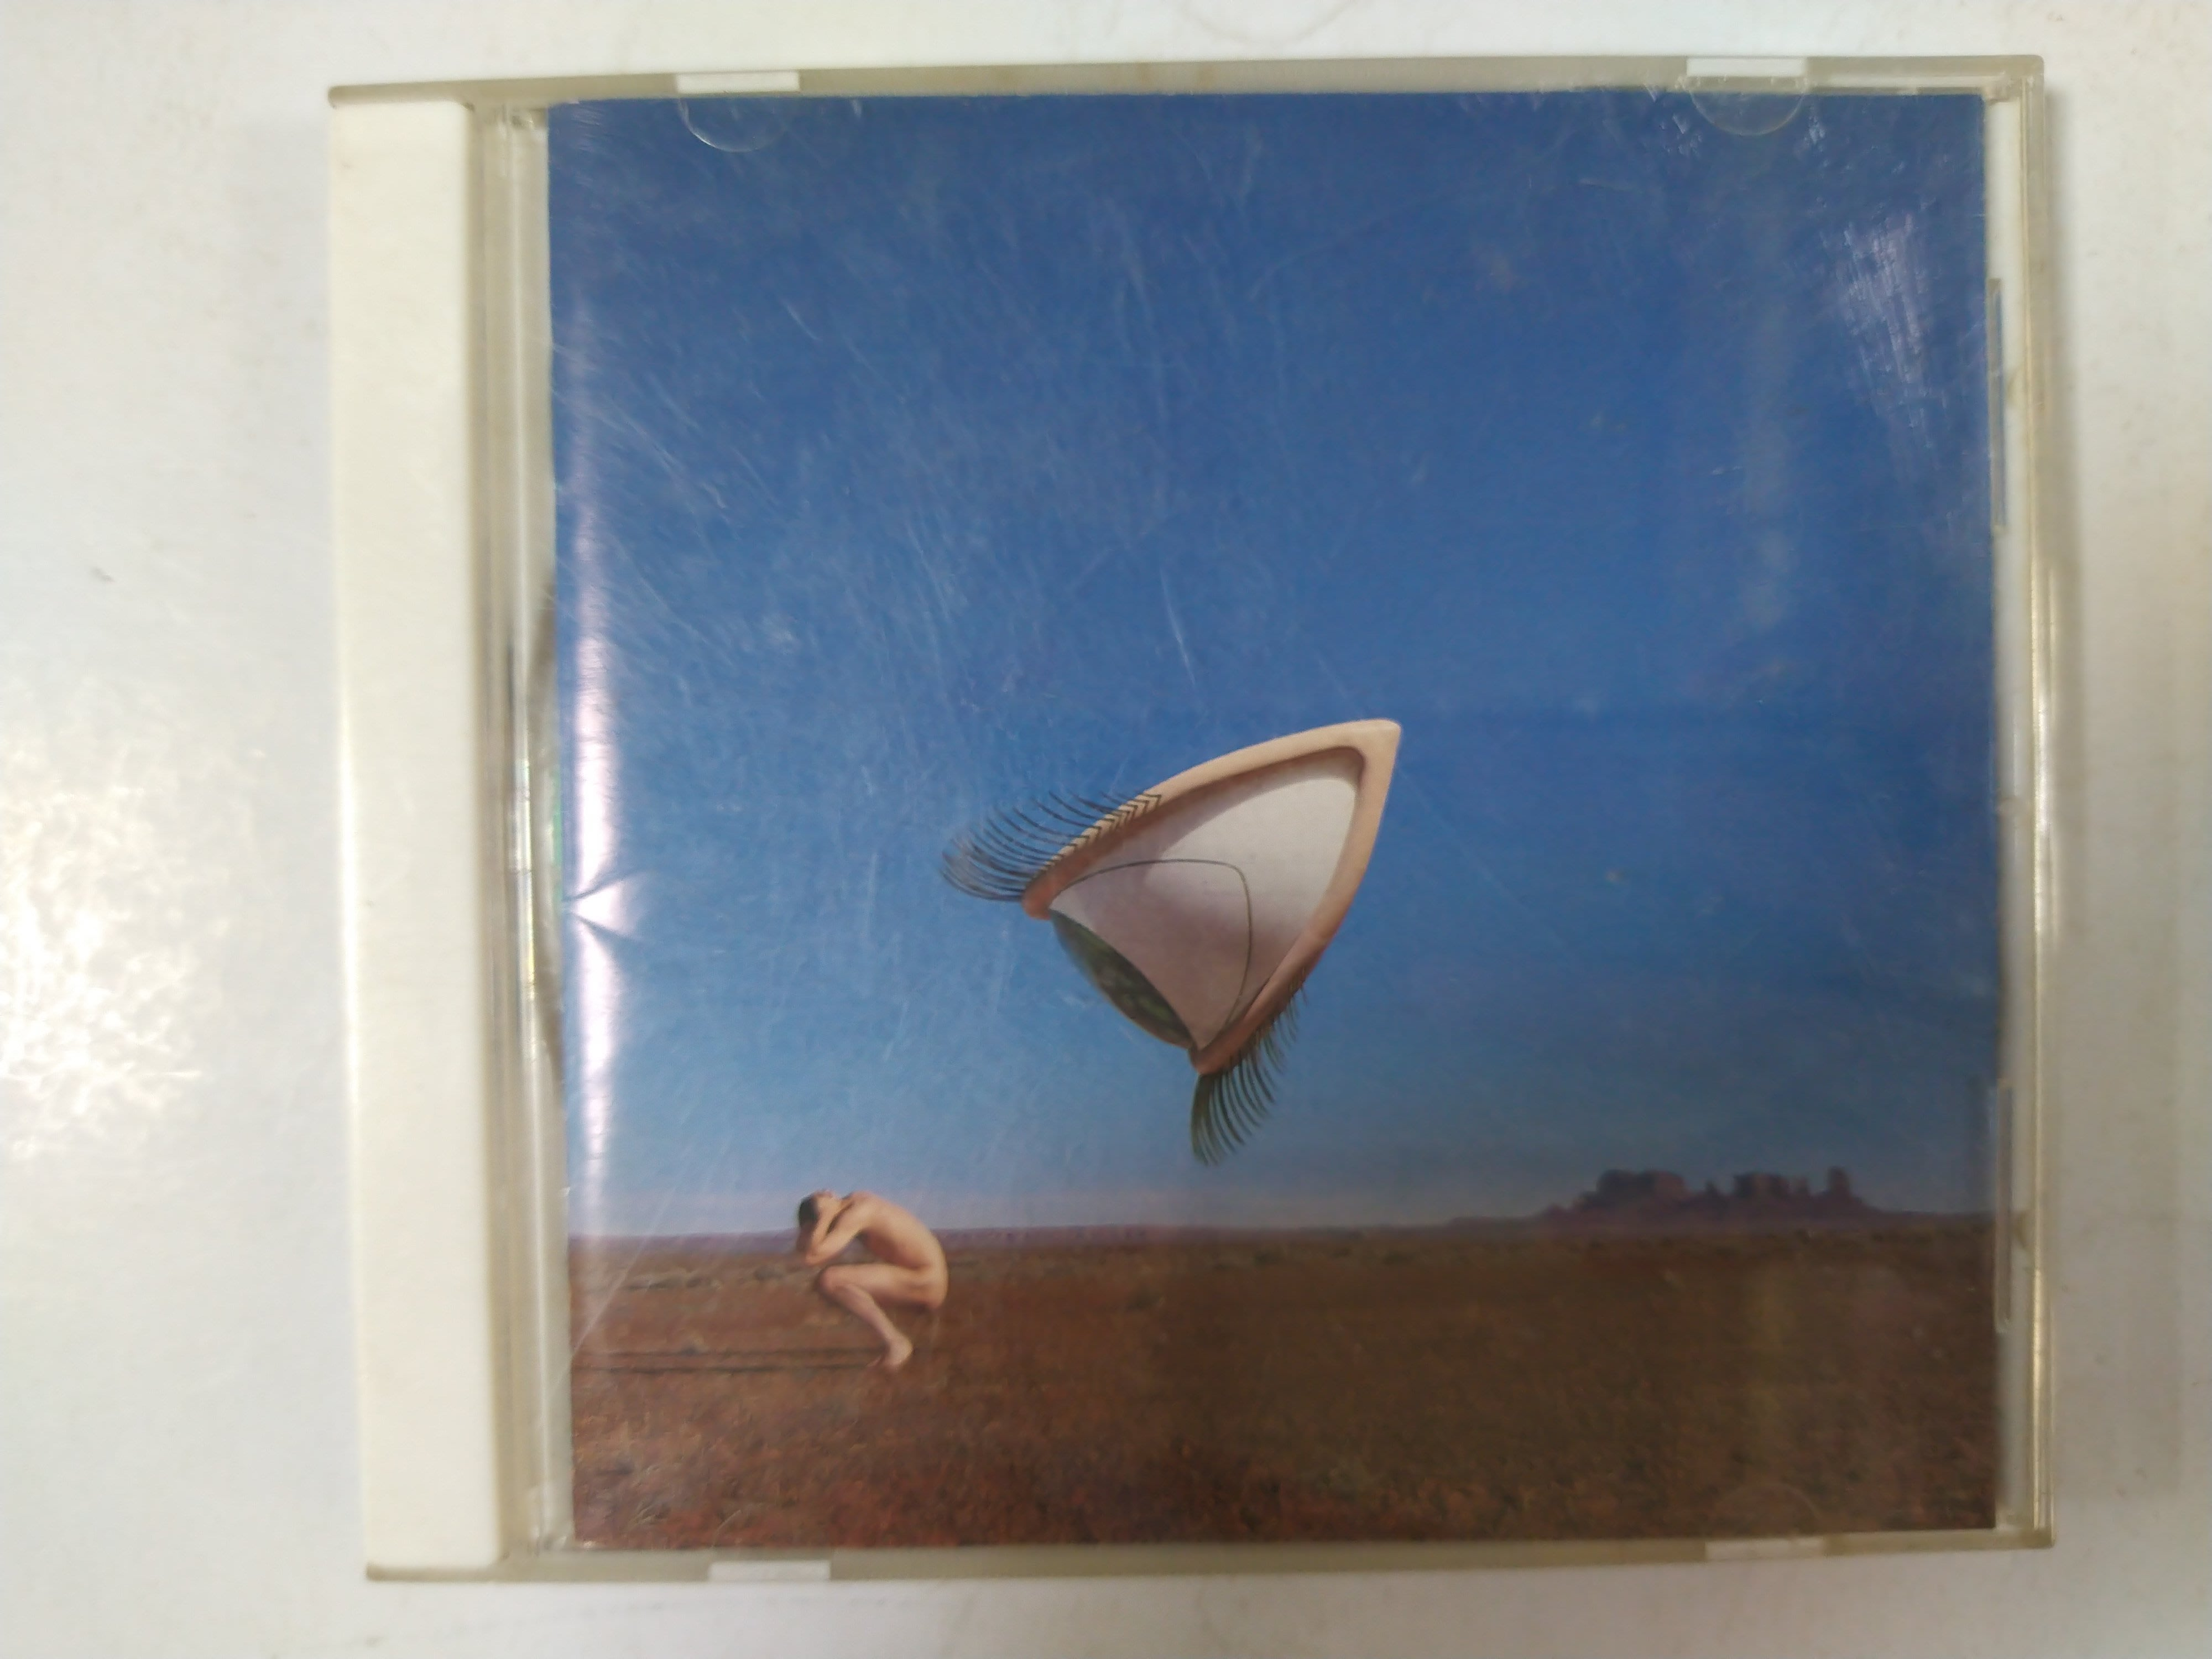 昀嫣音樂(CD6) THE CRANBERRIES : BURY THE HATCHET 1999年 EU壓片 片況如圖